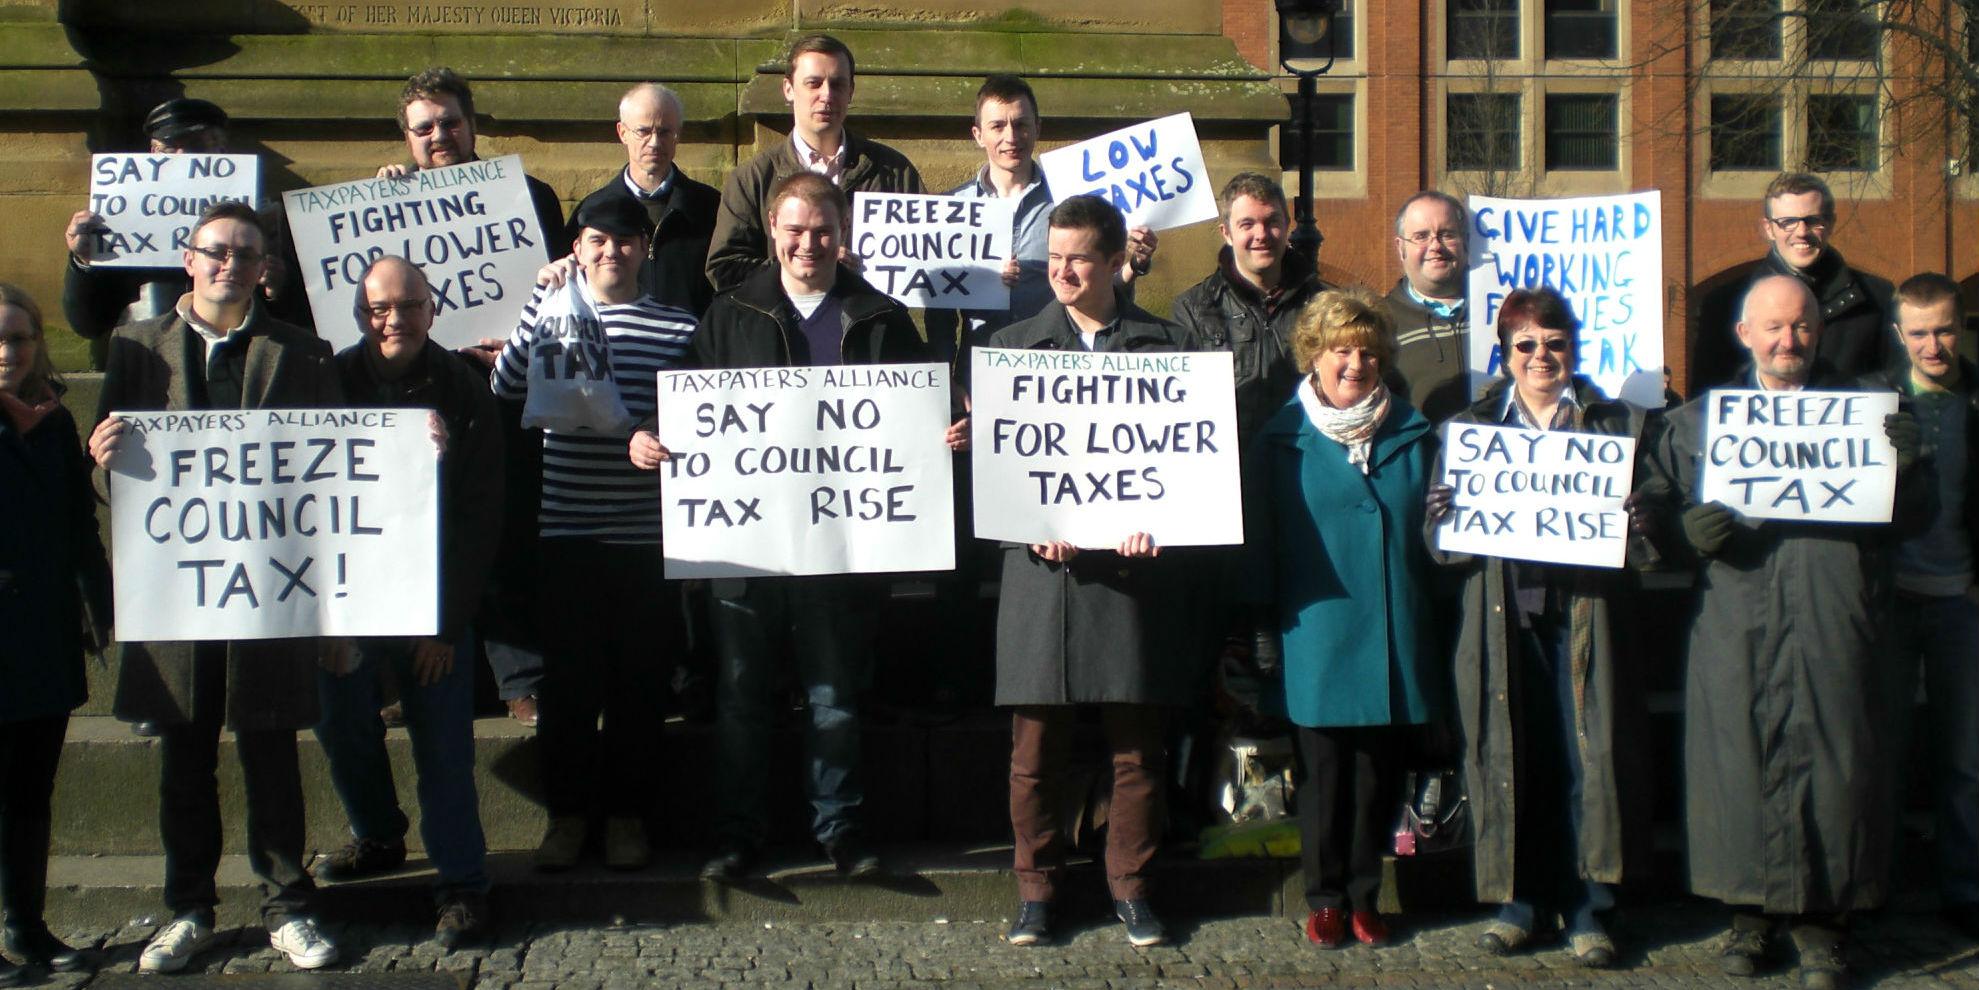 freeze_council_tax.jpg